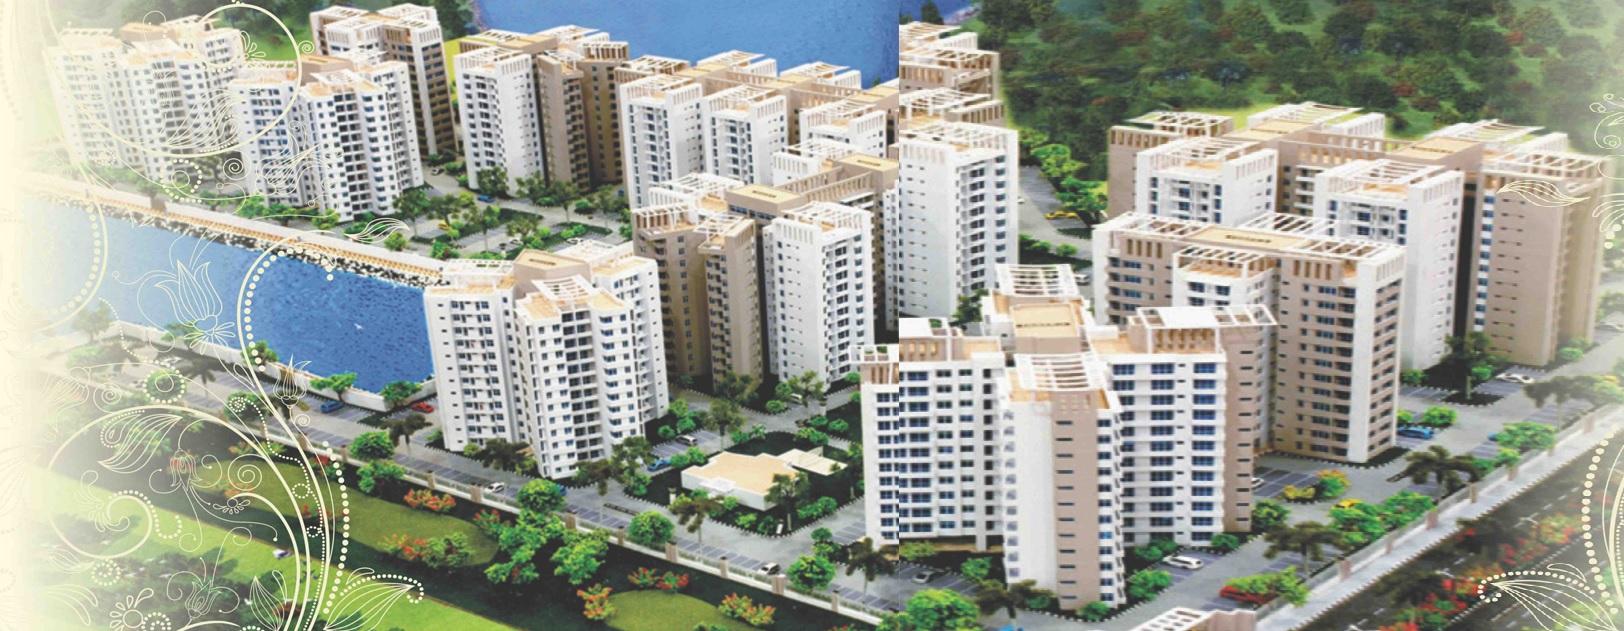 ansal api sushant megapolis fairway apartments i tower view6